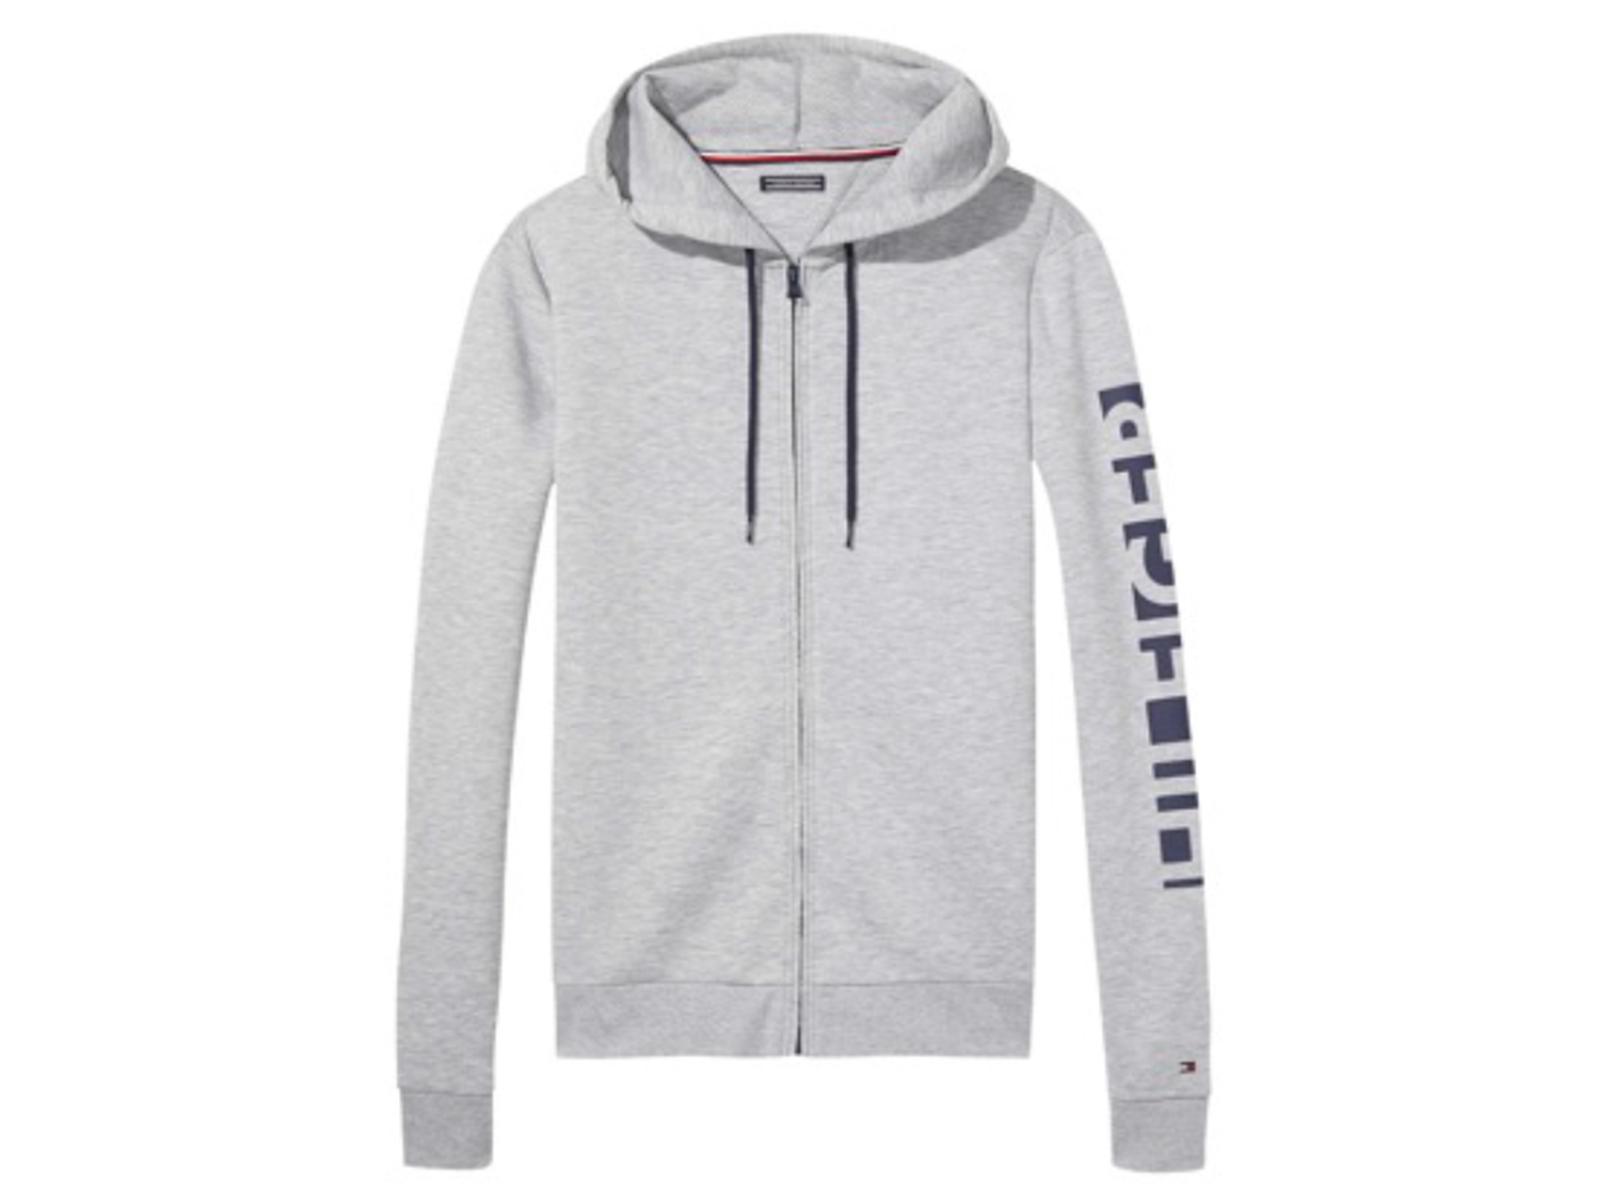 tommy hilfiger herren sweatjacke sweatshirt hoodie sport. Black Bedroom Furniture Sets. Home Design Ideas